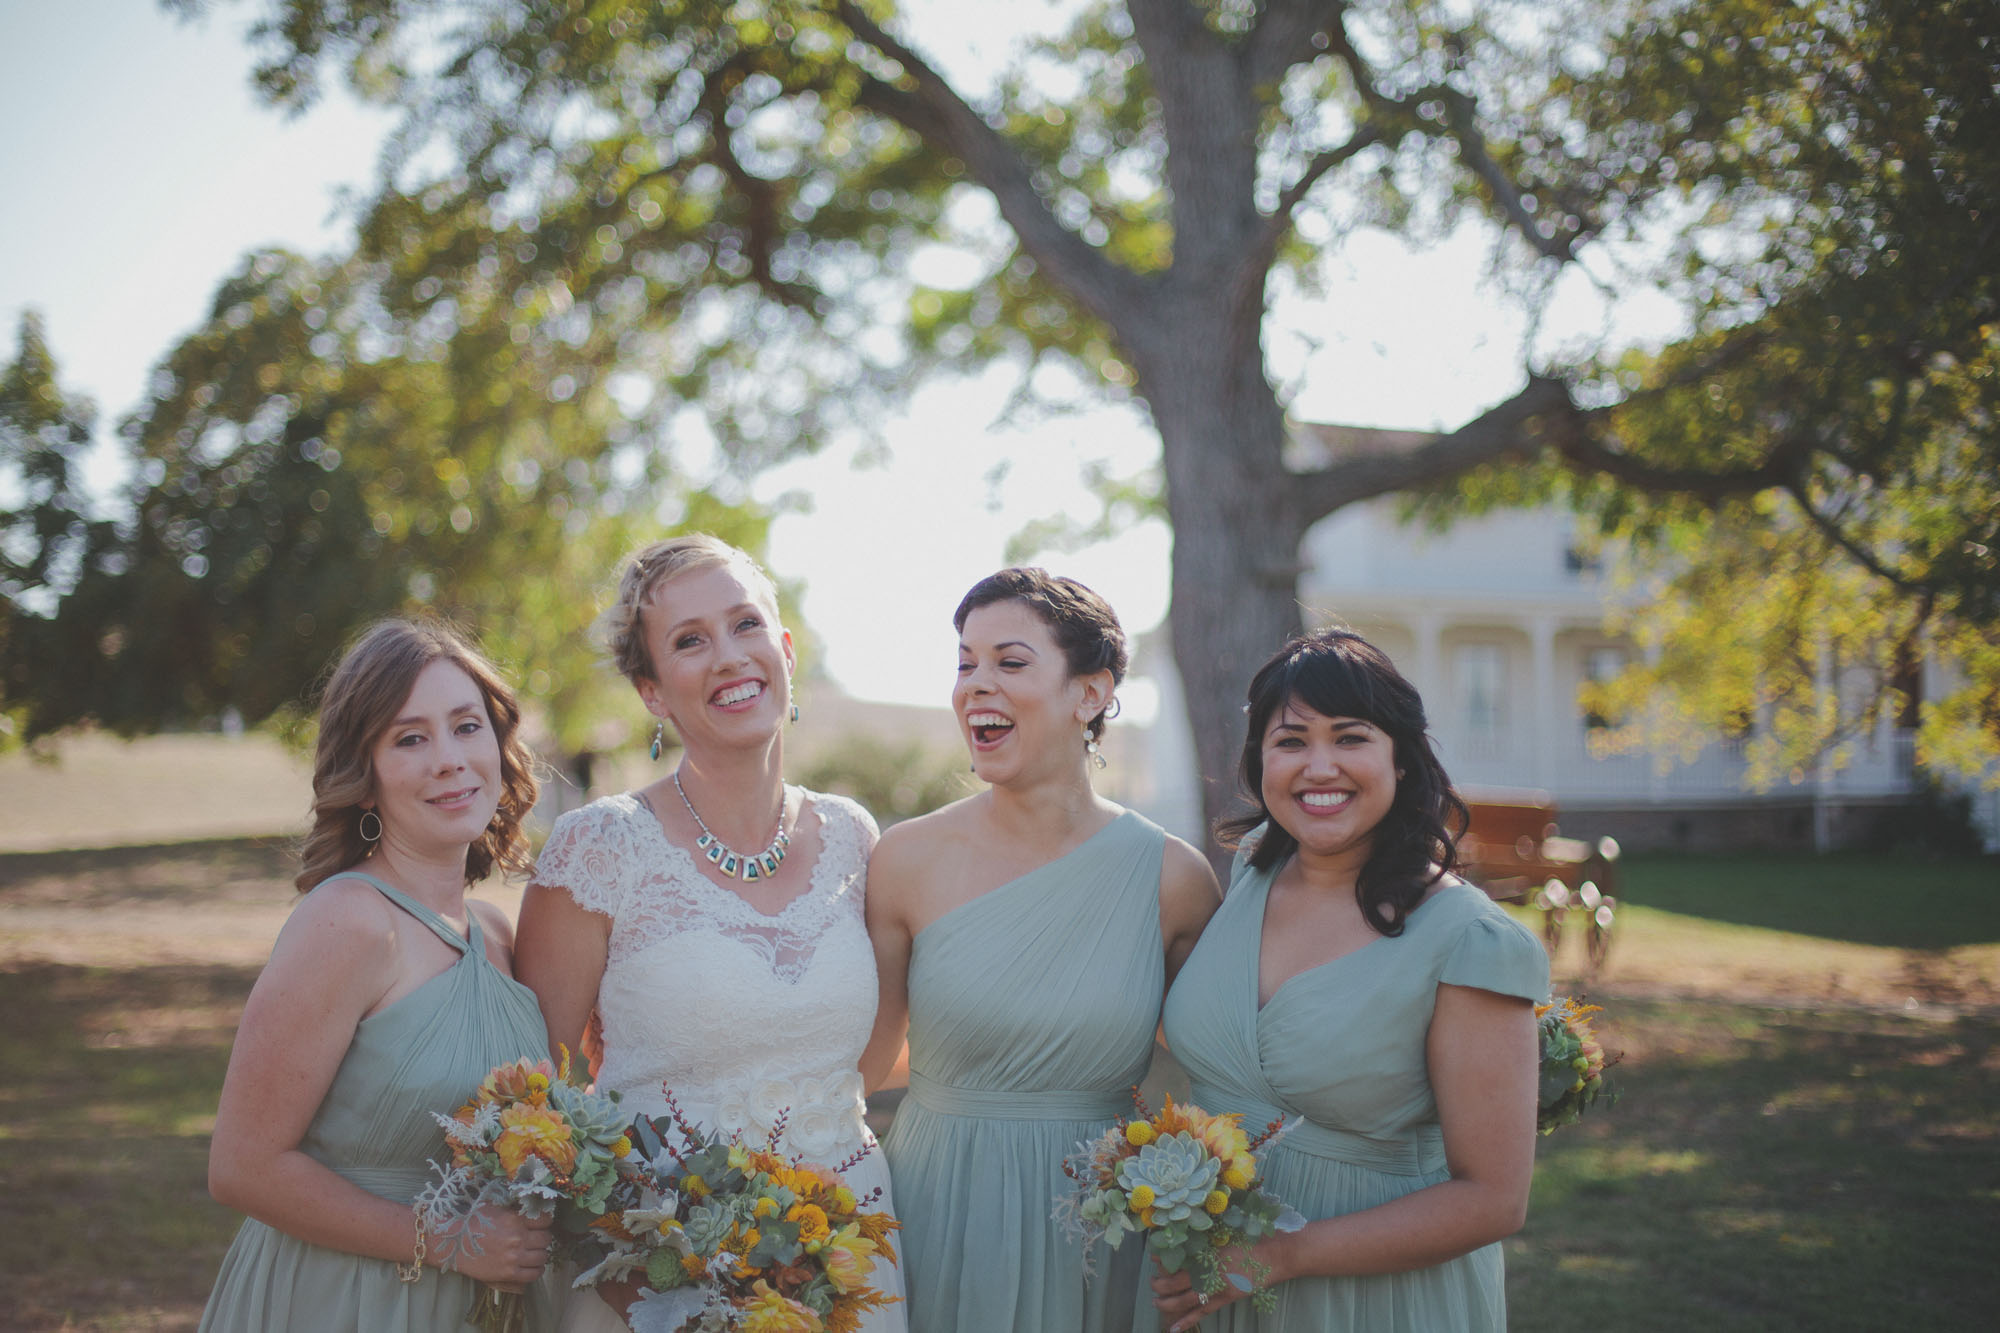 Gretchen_Gause_Petaluma_Olympias_Valley_Wedding_Photo-119.jpg